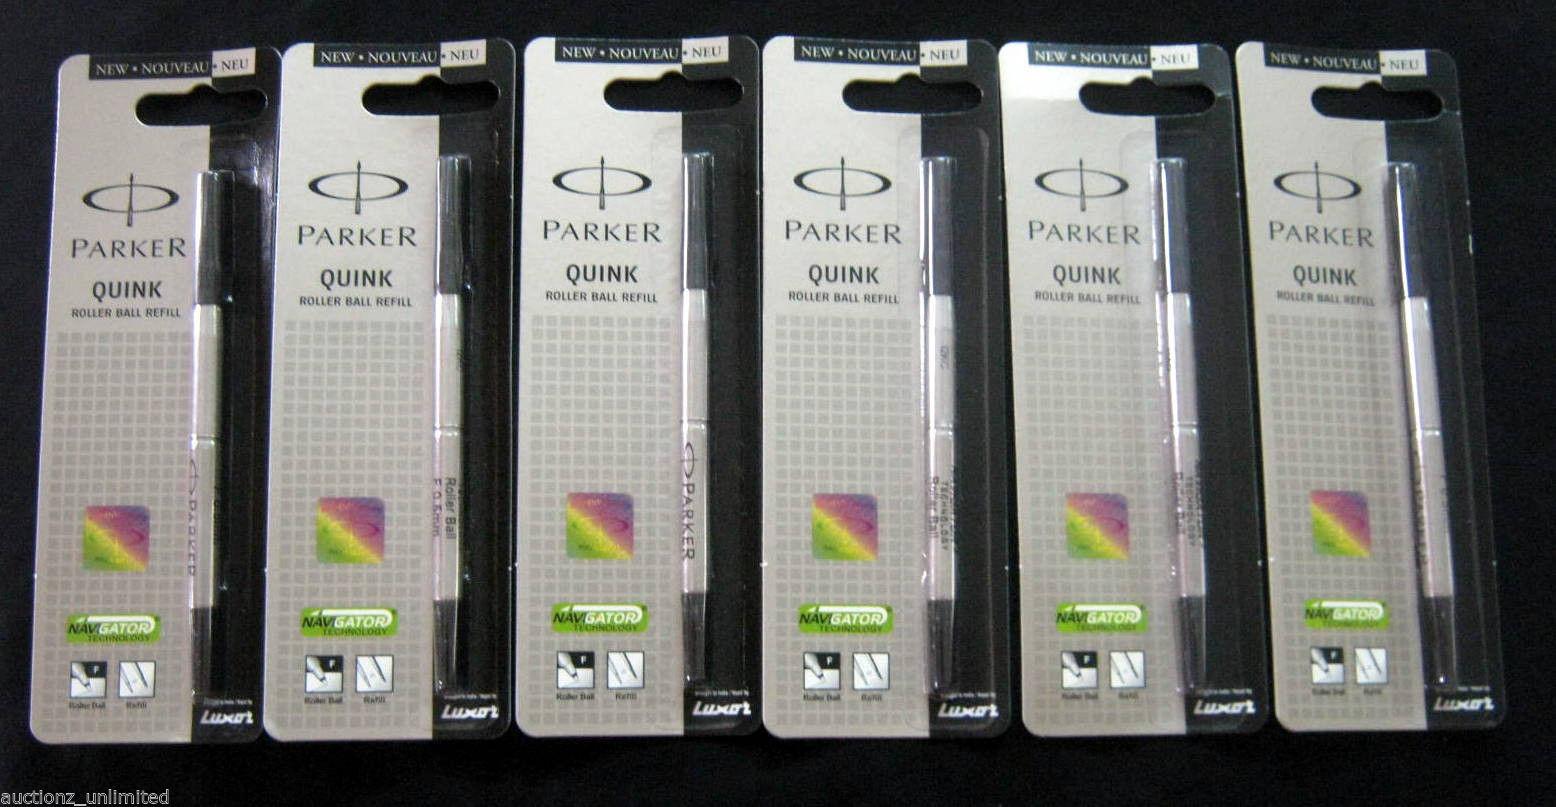 Parker Quink Roller Ball Refill, Black, Fine, New Sealed 100% Original- 6 Units